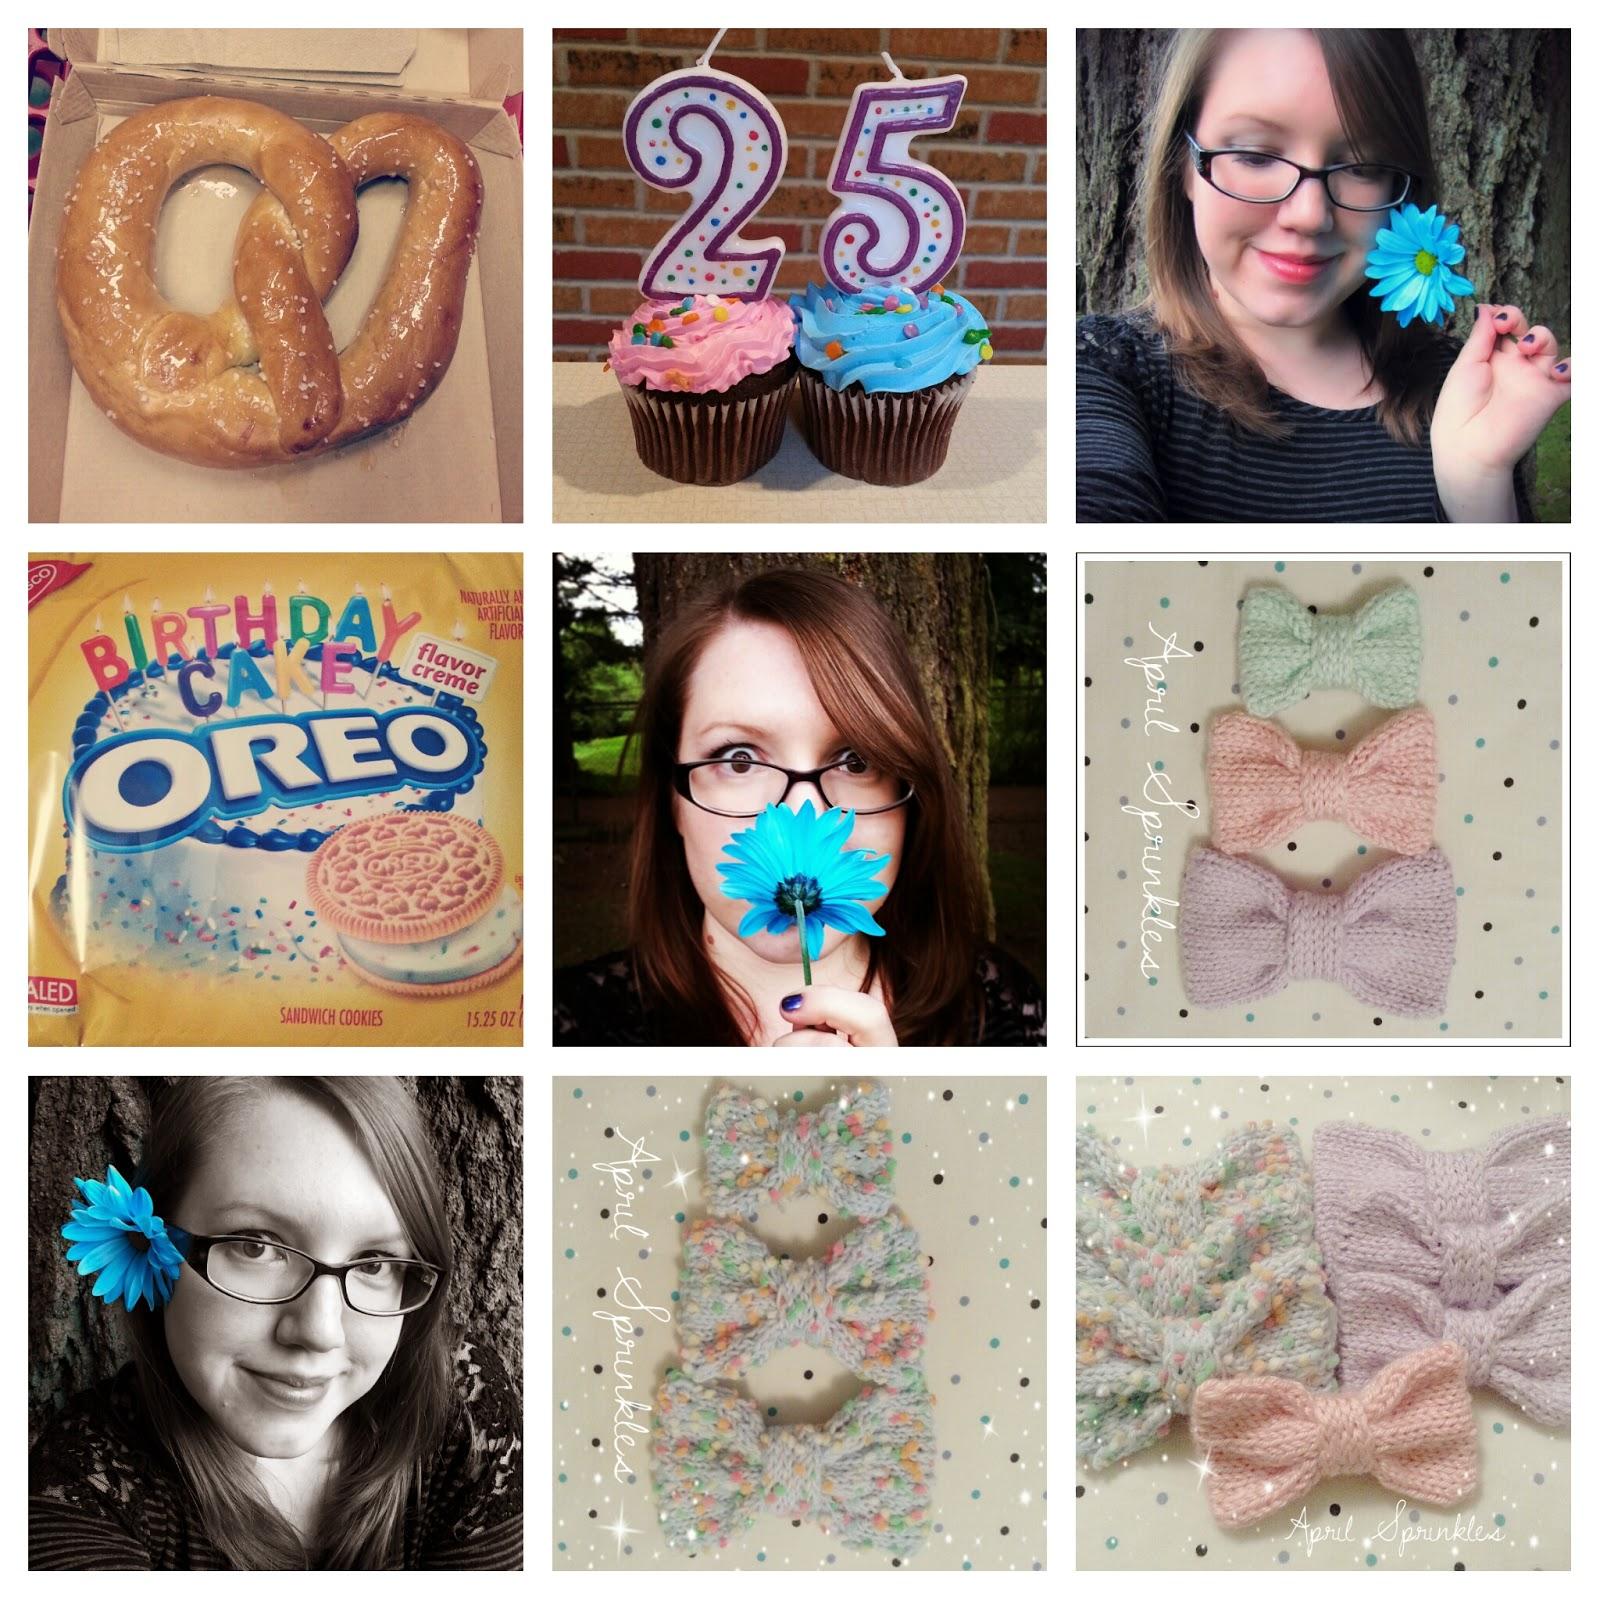 April Sprinkles photo roundup Instagram @craftylilkels